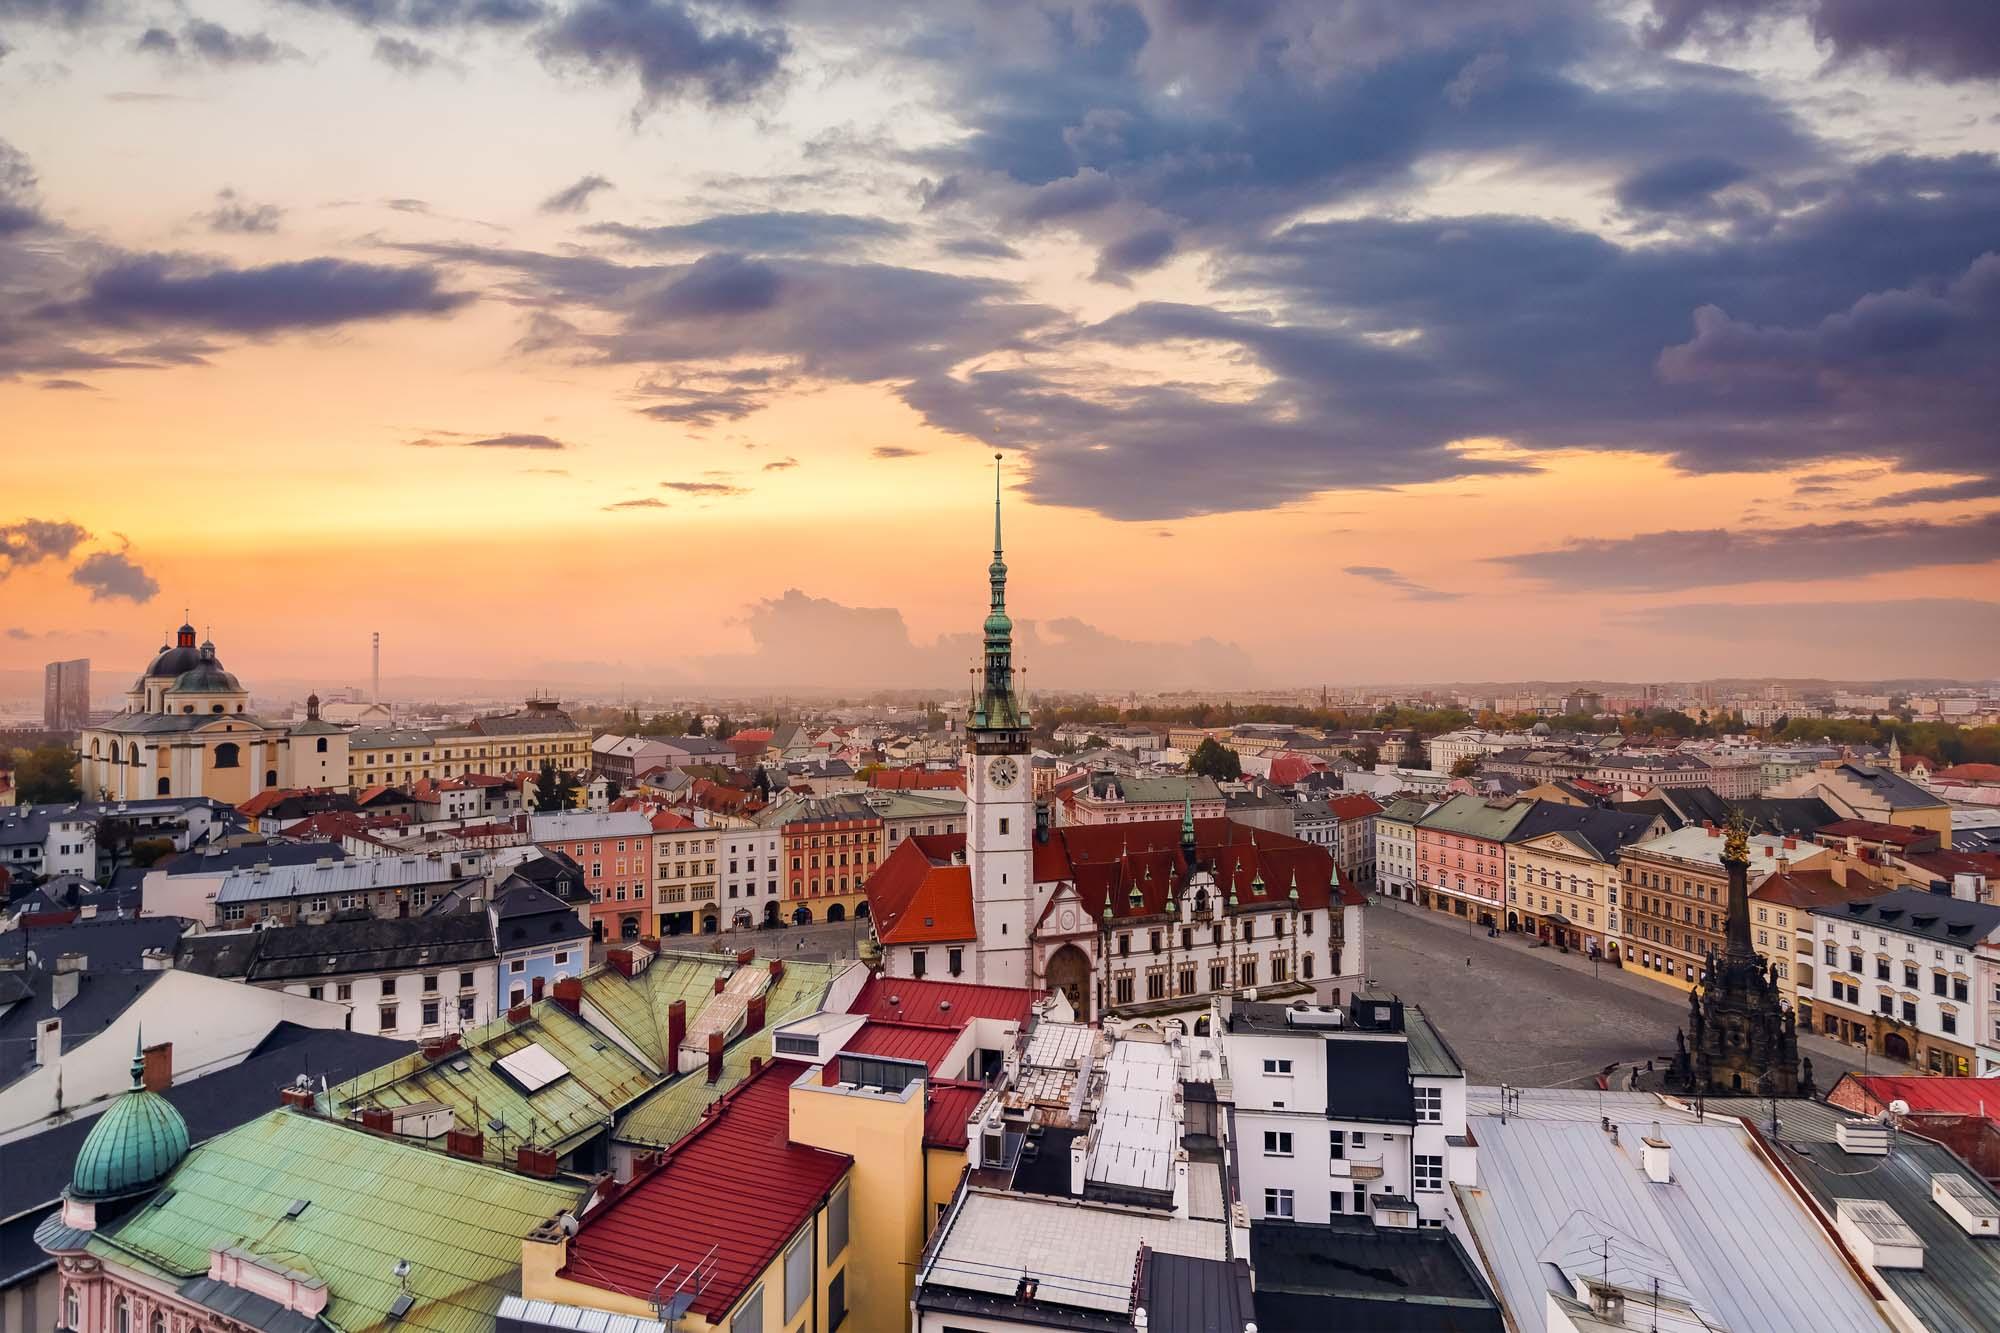 Olomouc city,  Czech Republic. Sunset